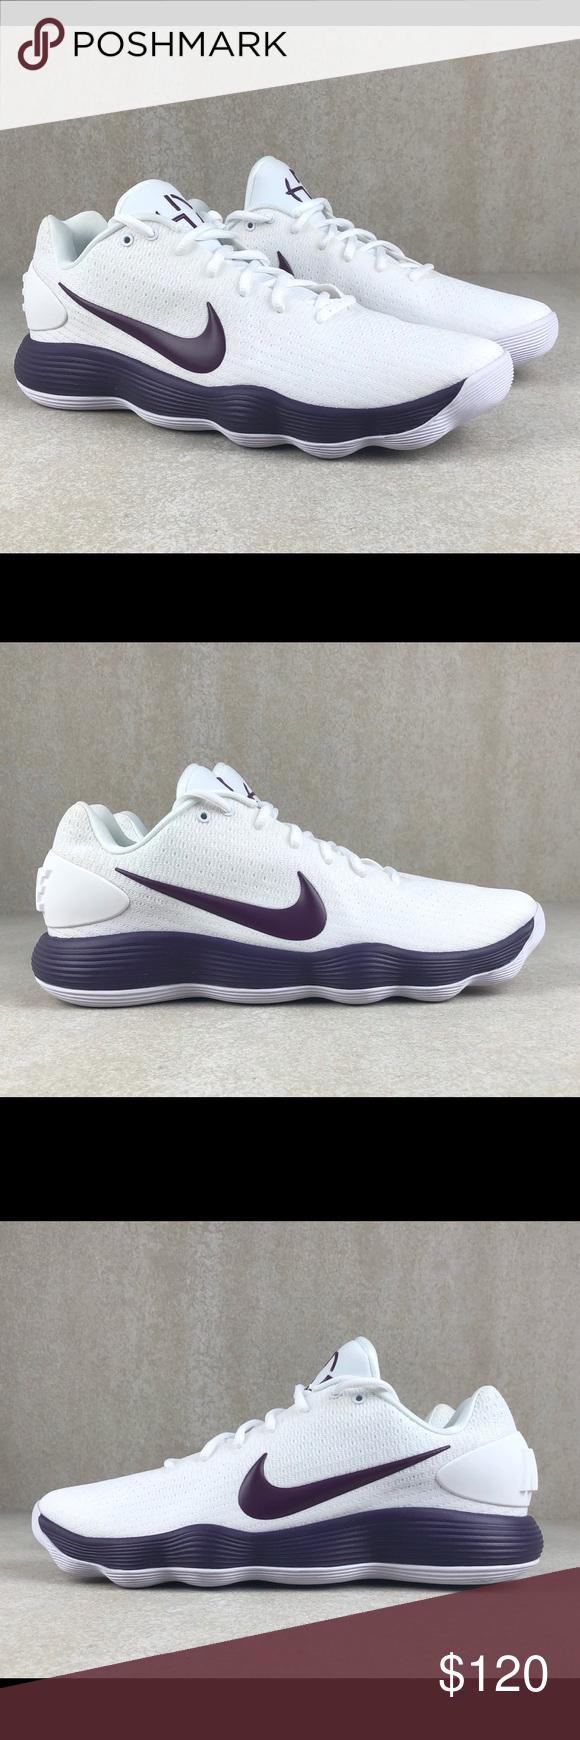 Nike Hyperdunk Low Purple White Basketball Shoes Nwt White Basketball Shoes Basketball Shoes Nike